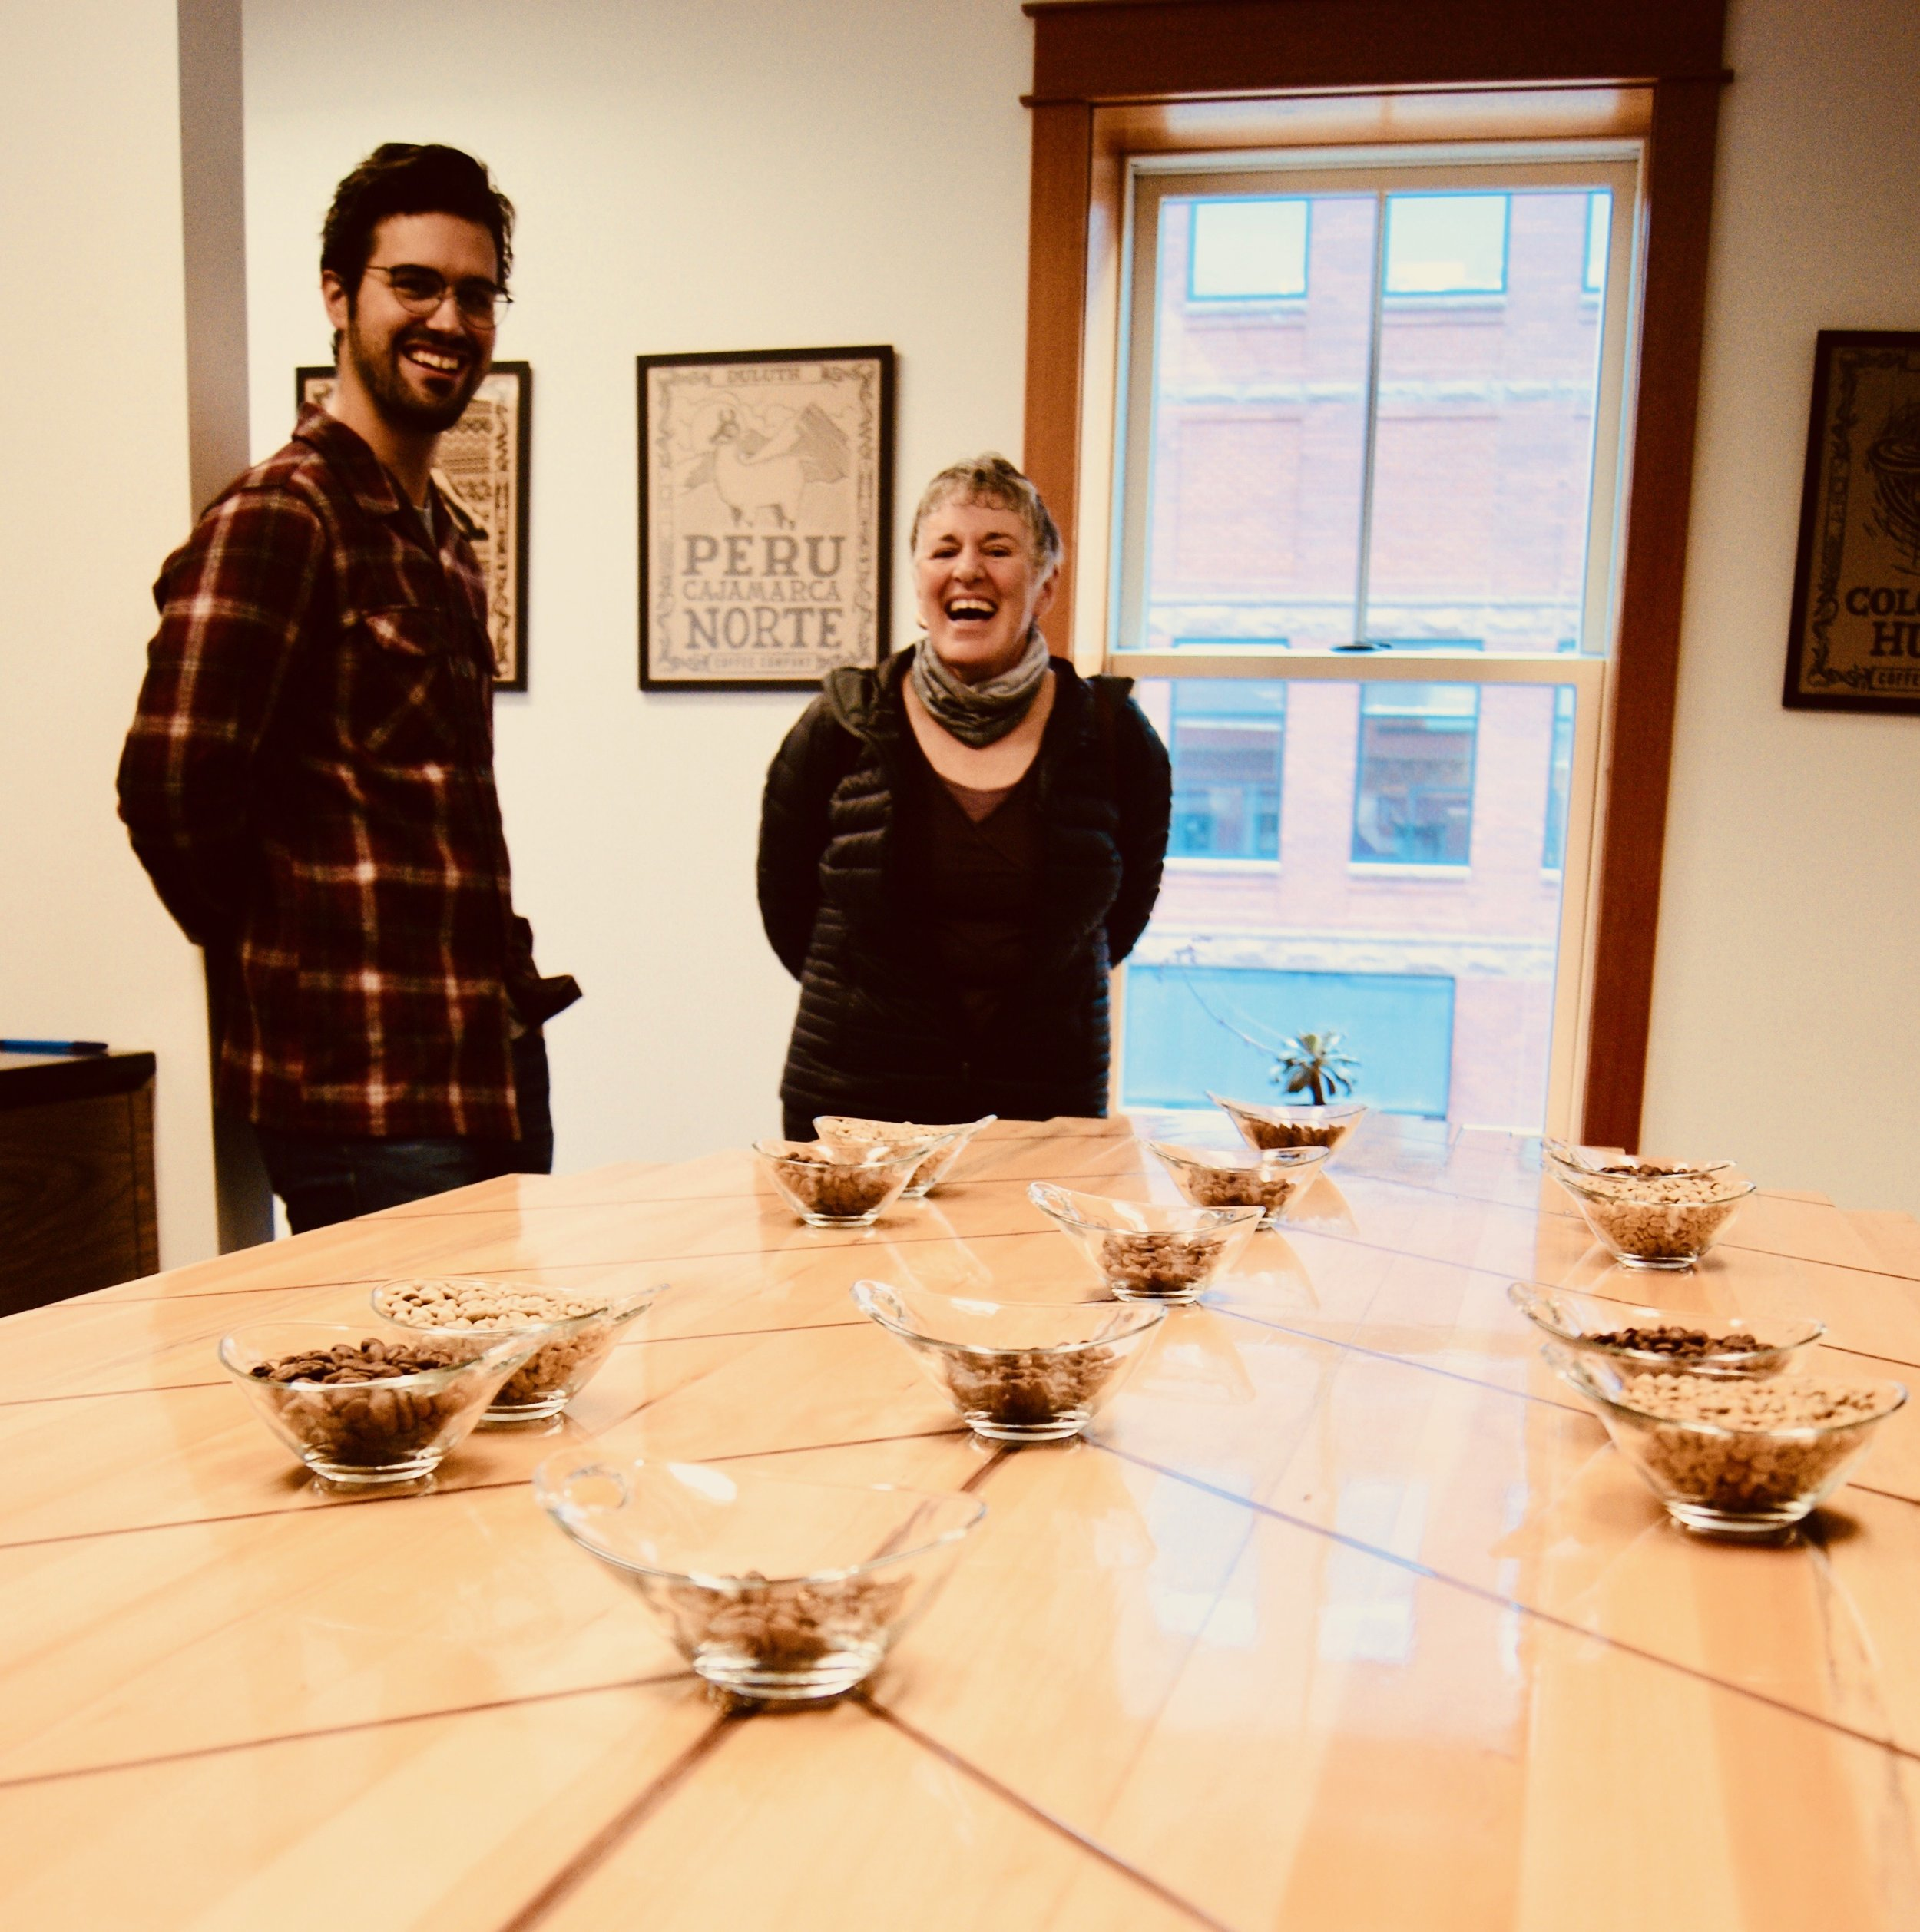 Sam Levar and Rita Rasmuson